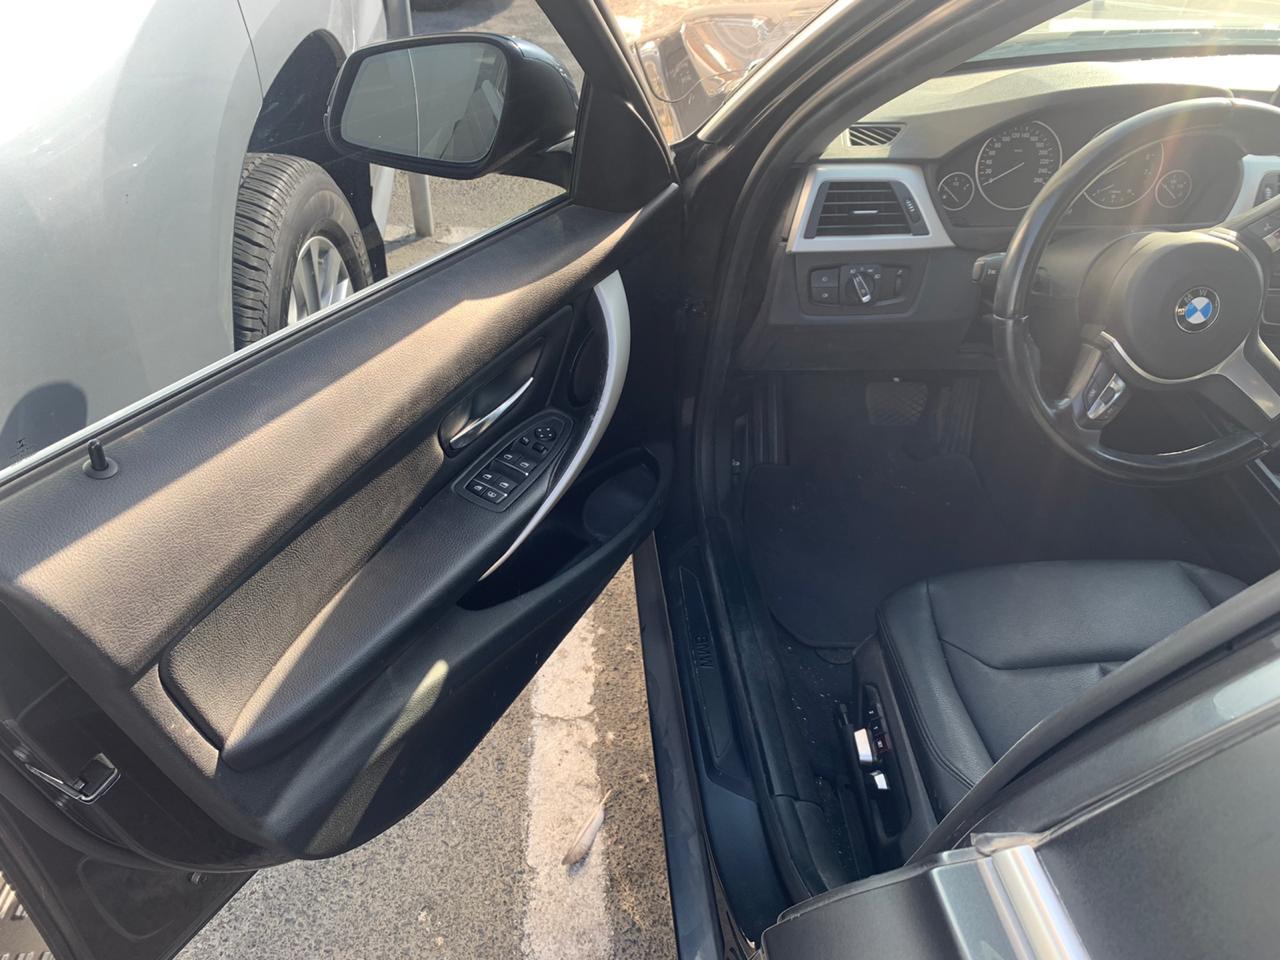 BMW 318i Metal Grey in Dubai - Image 7